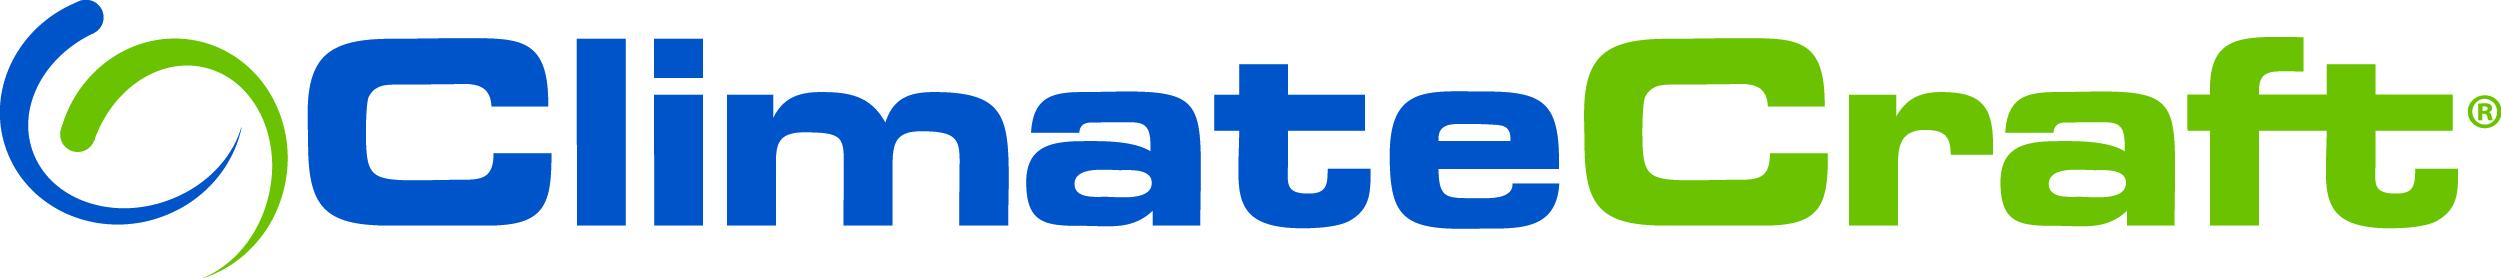 ClimateCraft.final logo